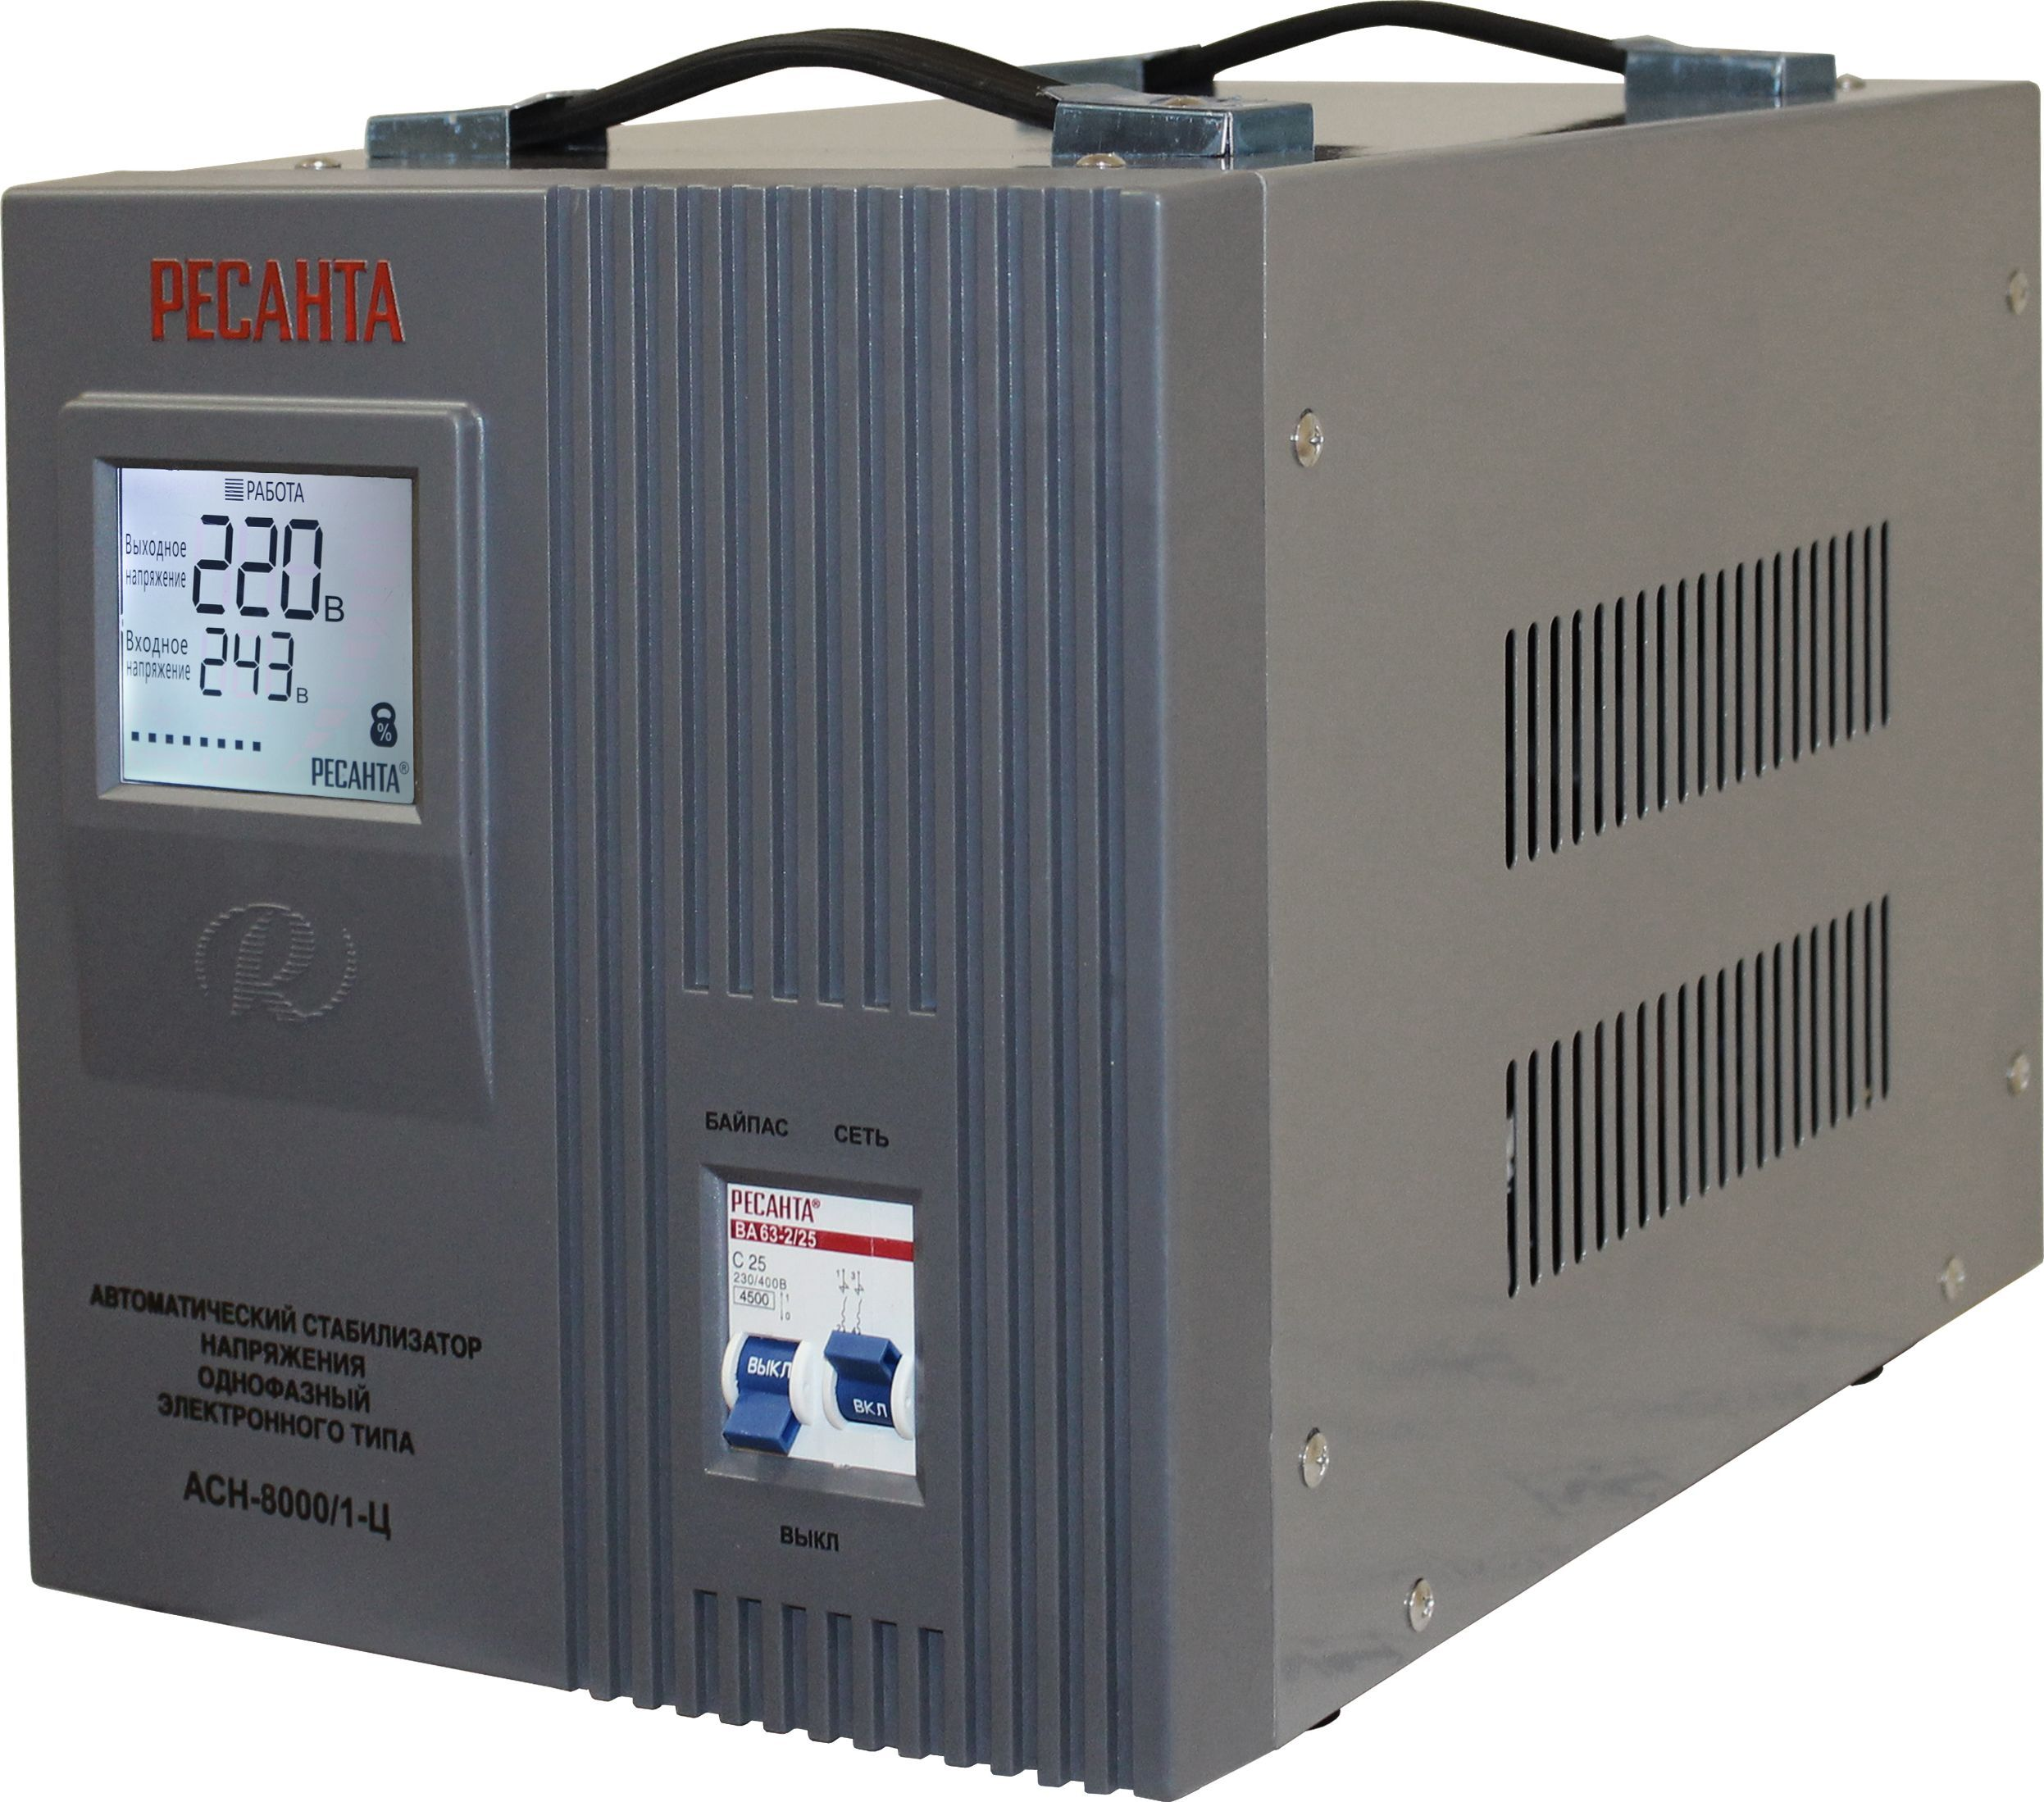 Стабилизатор напряжения Ресанта, АСН-8000/1-Ц, электронный, однофазный, цвет: серый стабилизатор напряжения ресанта ach 10000 1 ц 1 розетка серый